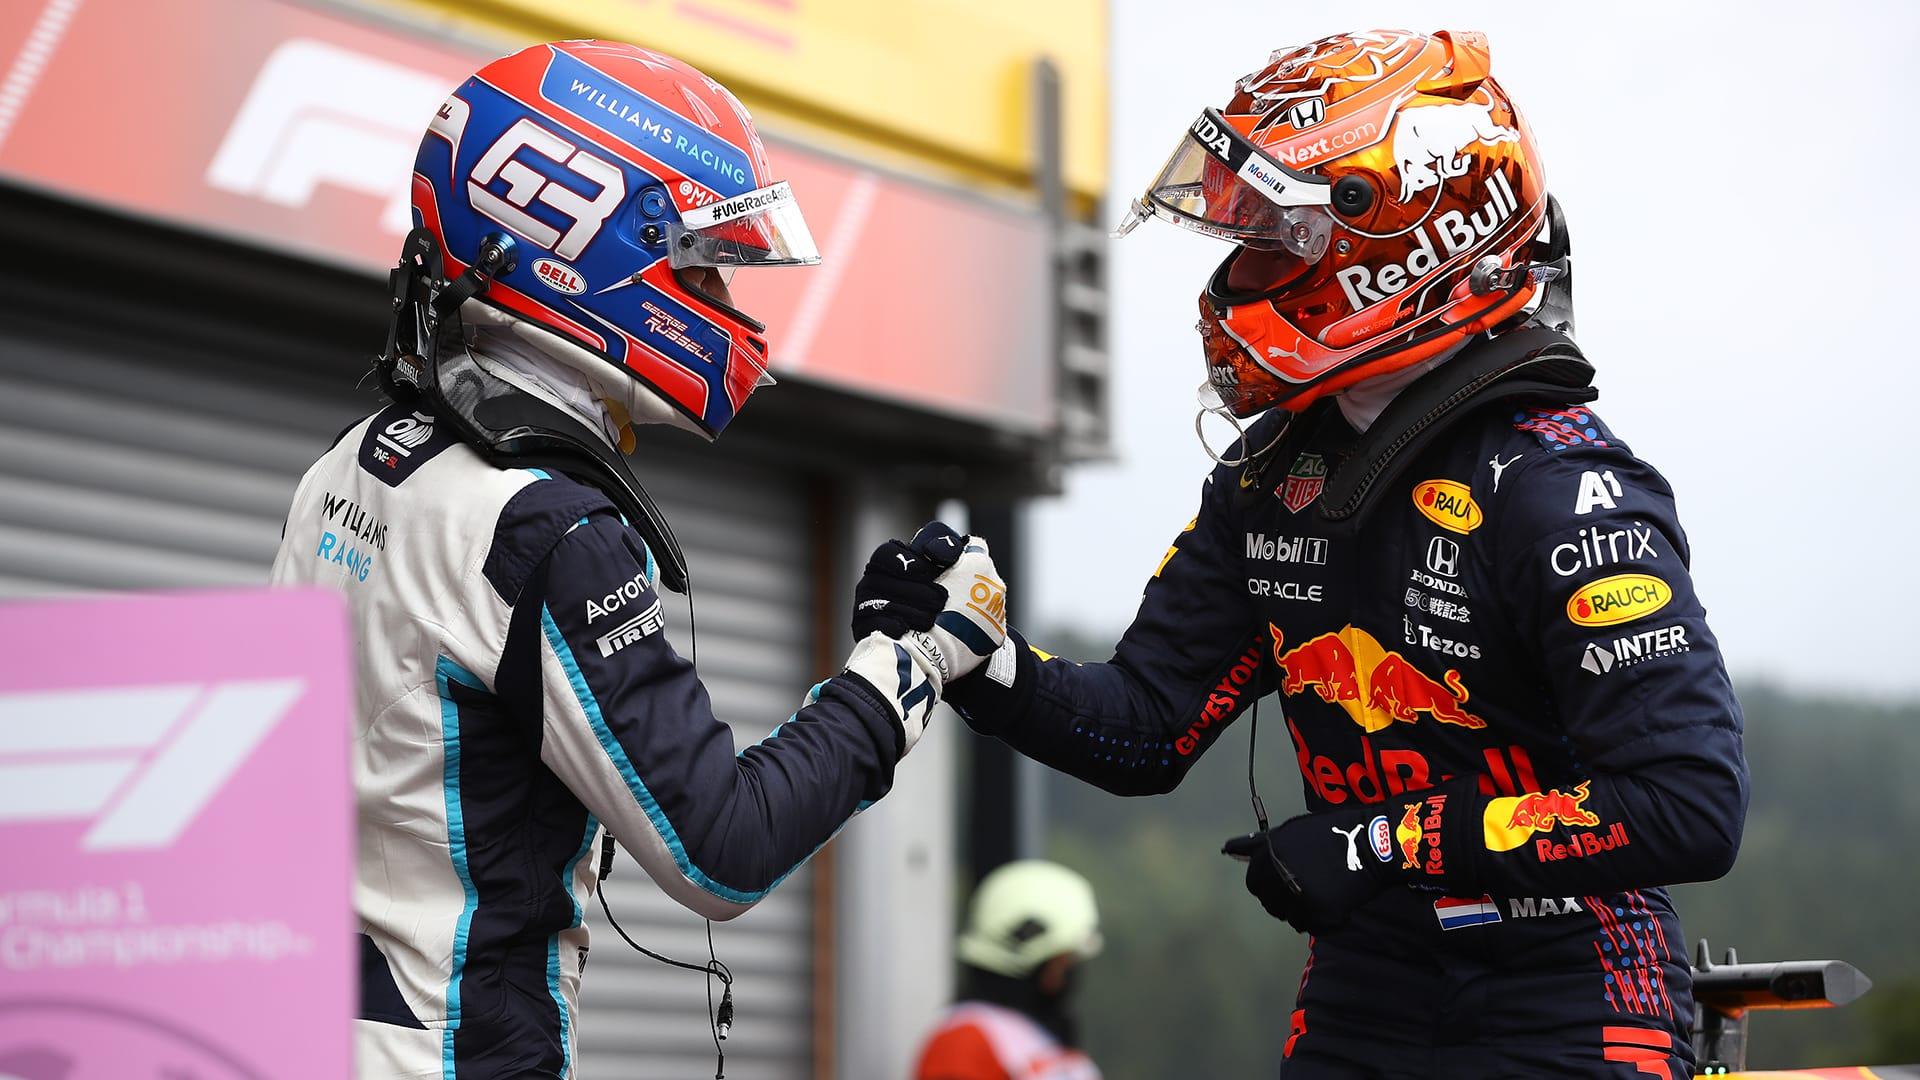 Verstappen consigue la pole en Bélgica, Russell partirá segundo